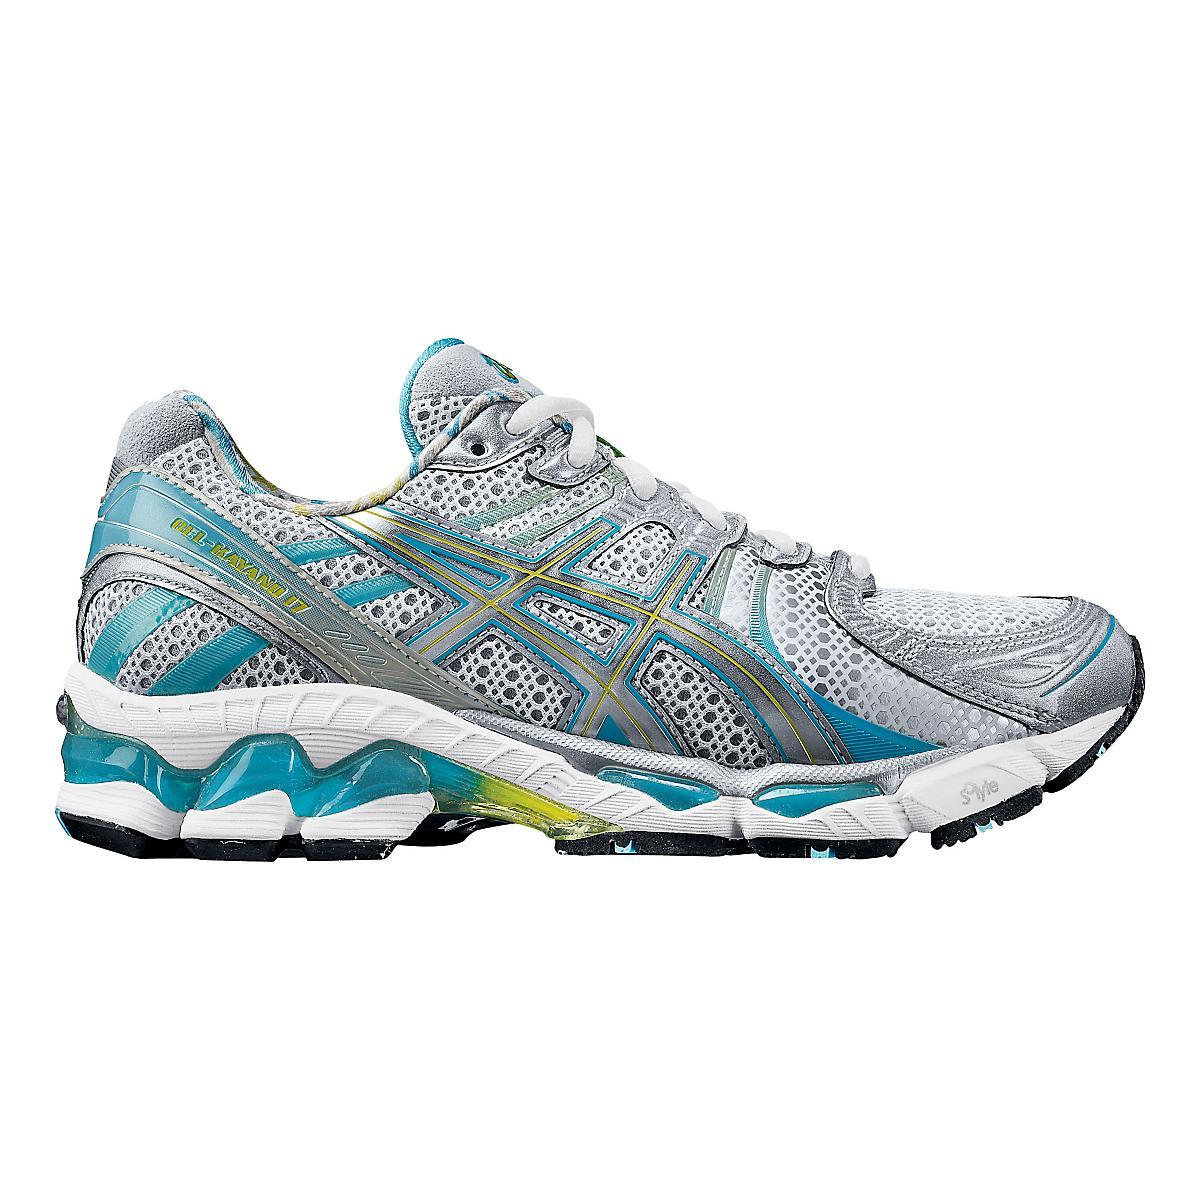 cheap for discount 4ba69 74728 Womens ASICS GEL-Kayano 17 Running Shoe at Road Runner Sports